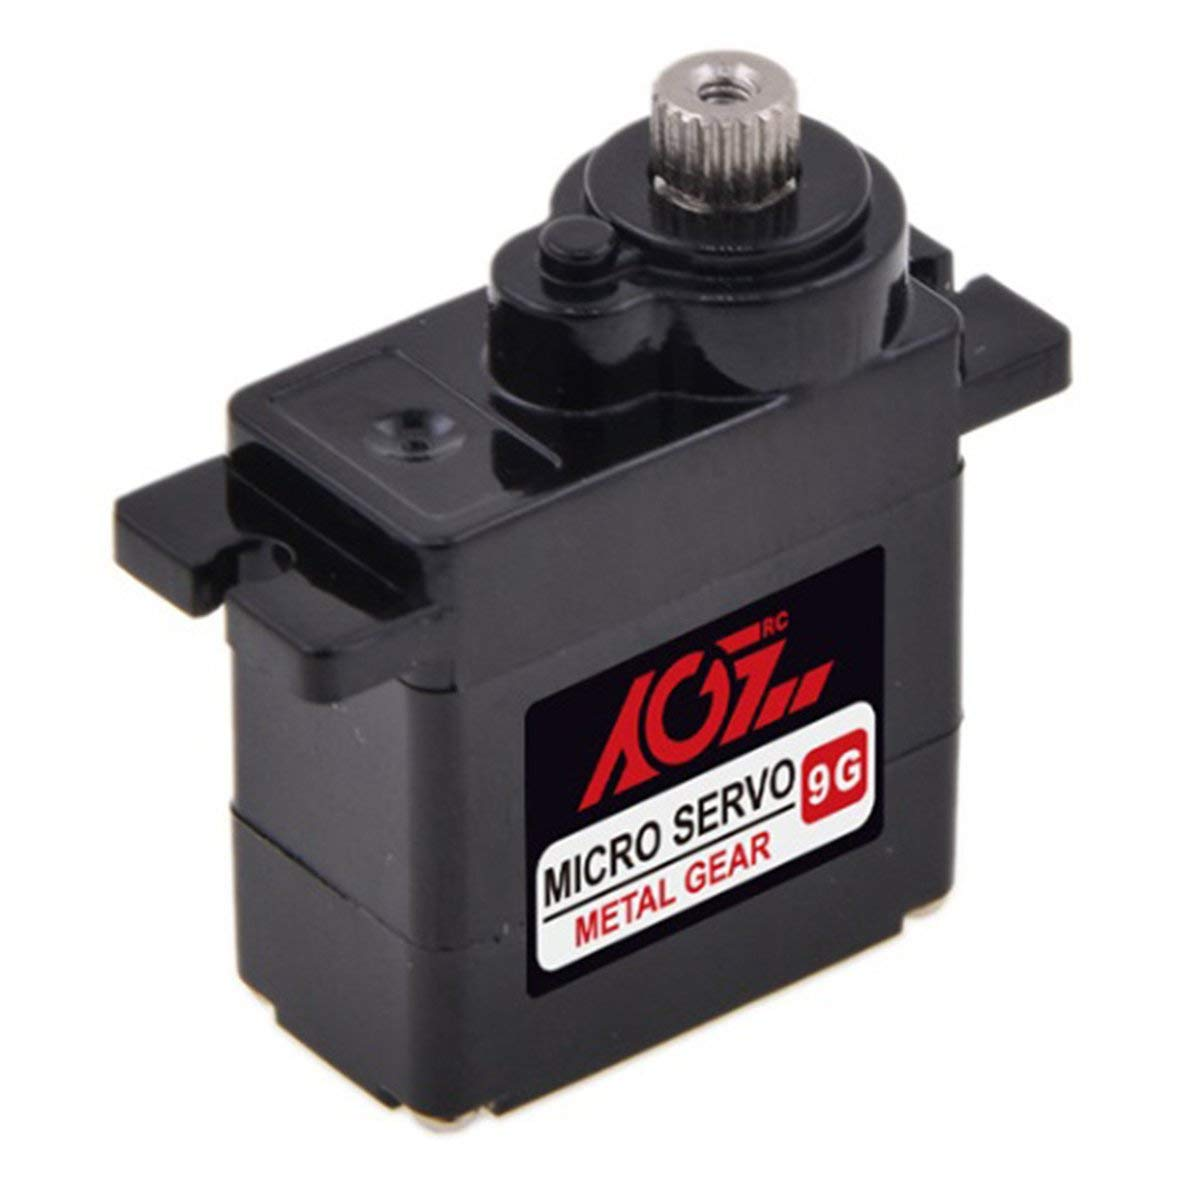 Noradtjcca Professional B11DLS Mini Kontinuierliche Drehung 360 Grad Leistung Standard Kunststoff Servo Fit F/ür Roboter